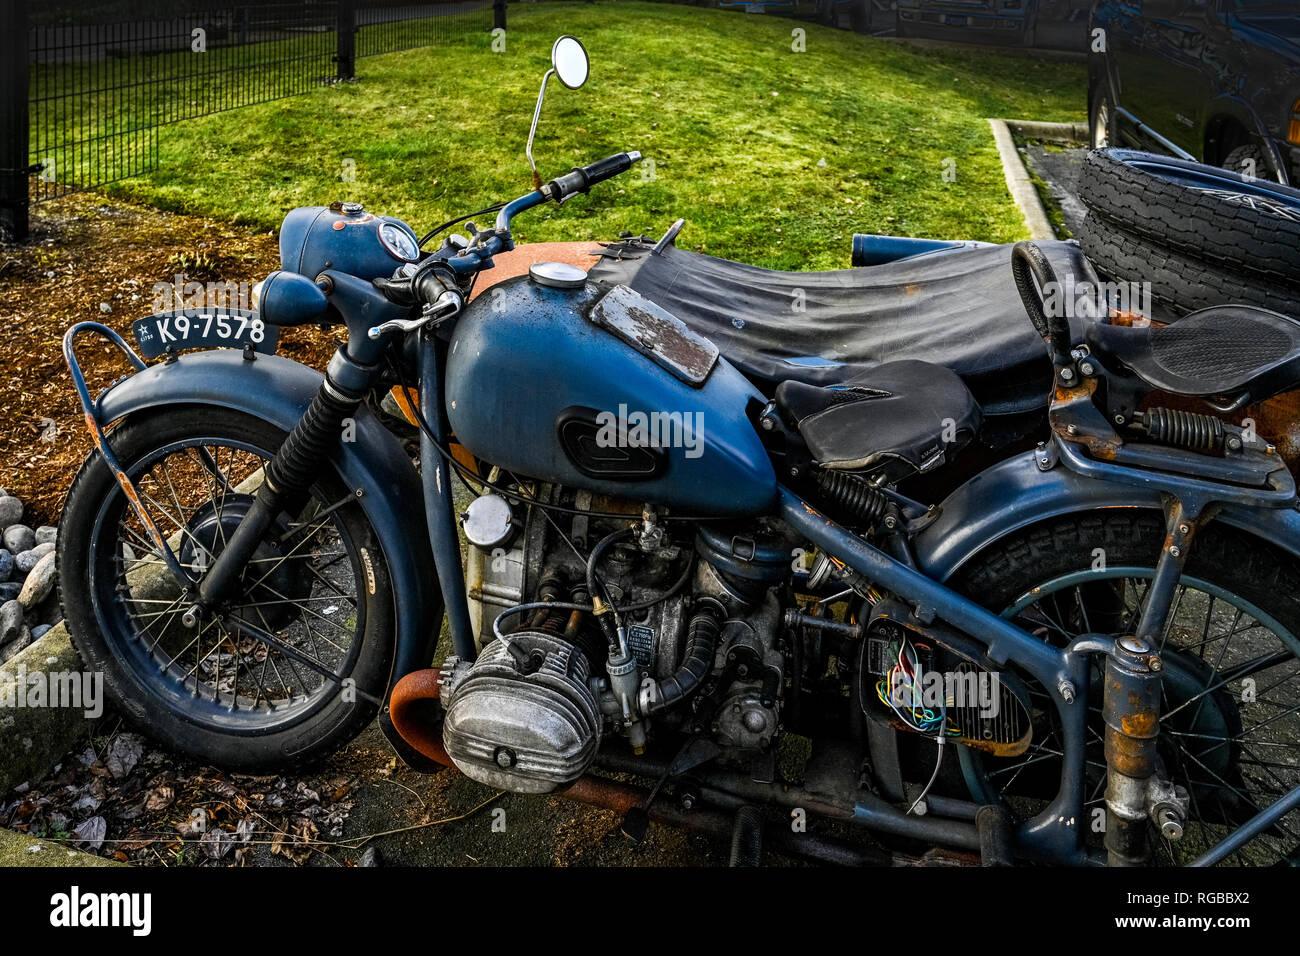 jahrgang alte kawasaki motorrad mit seitenwagen stockfoto. Black Bedroom Furniture Sets. Home Design Ideas